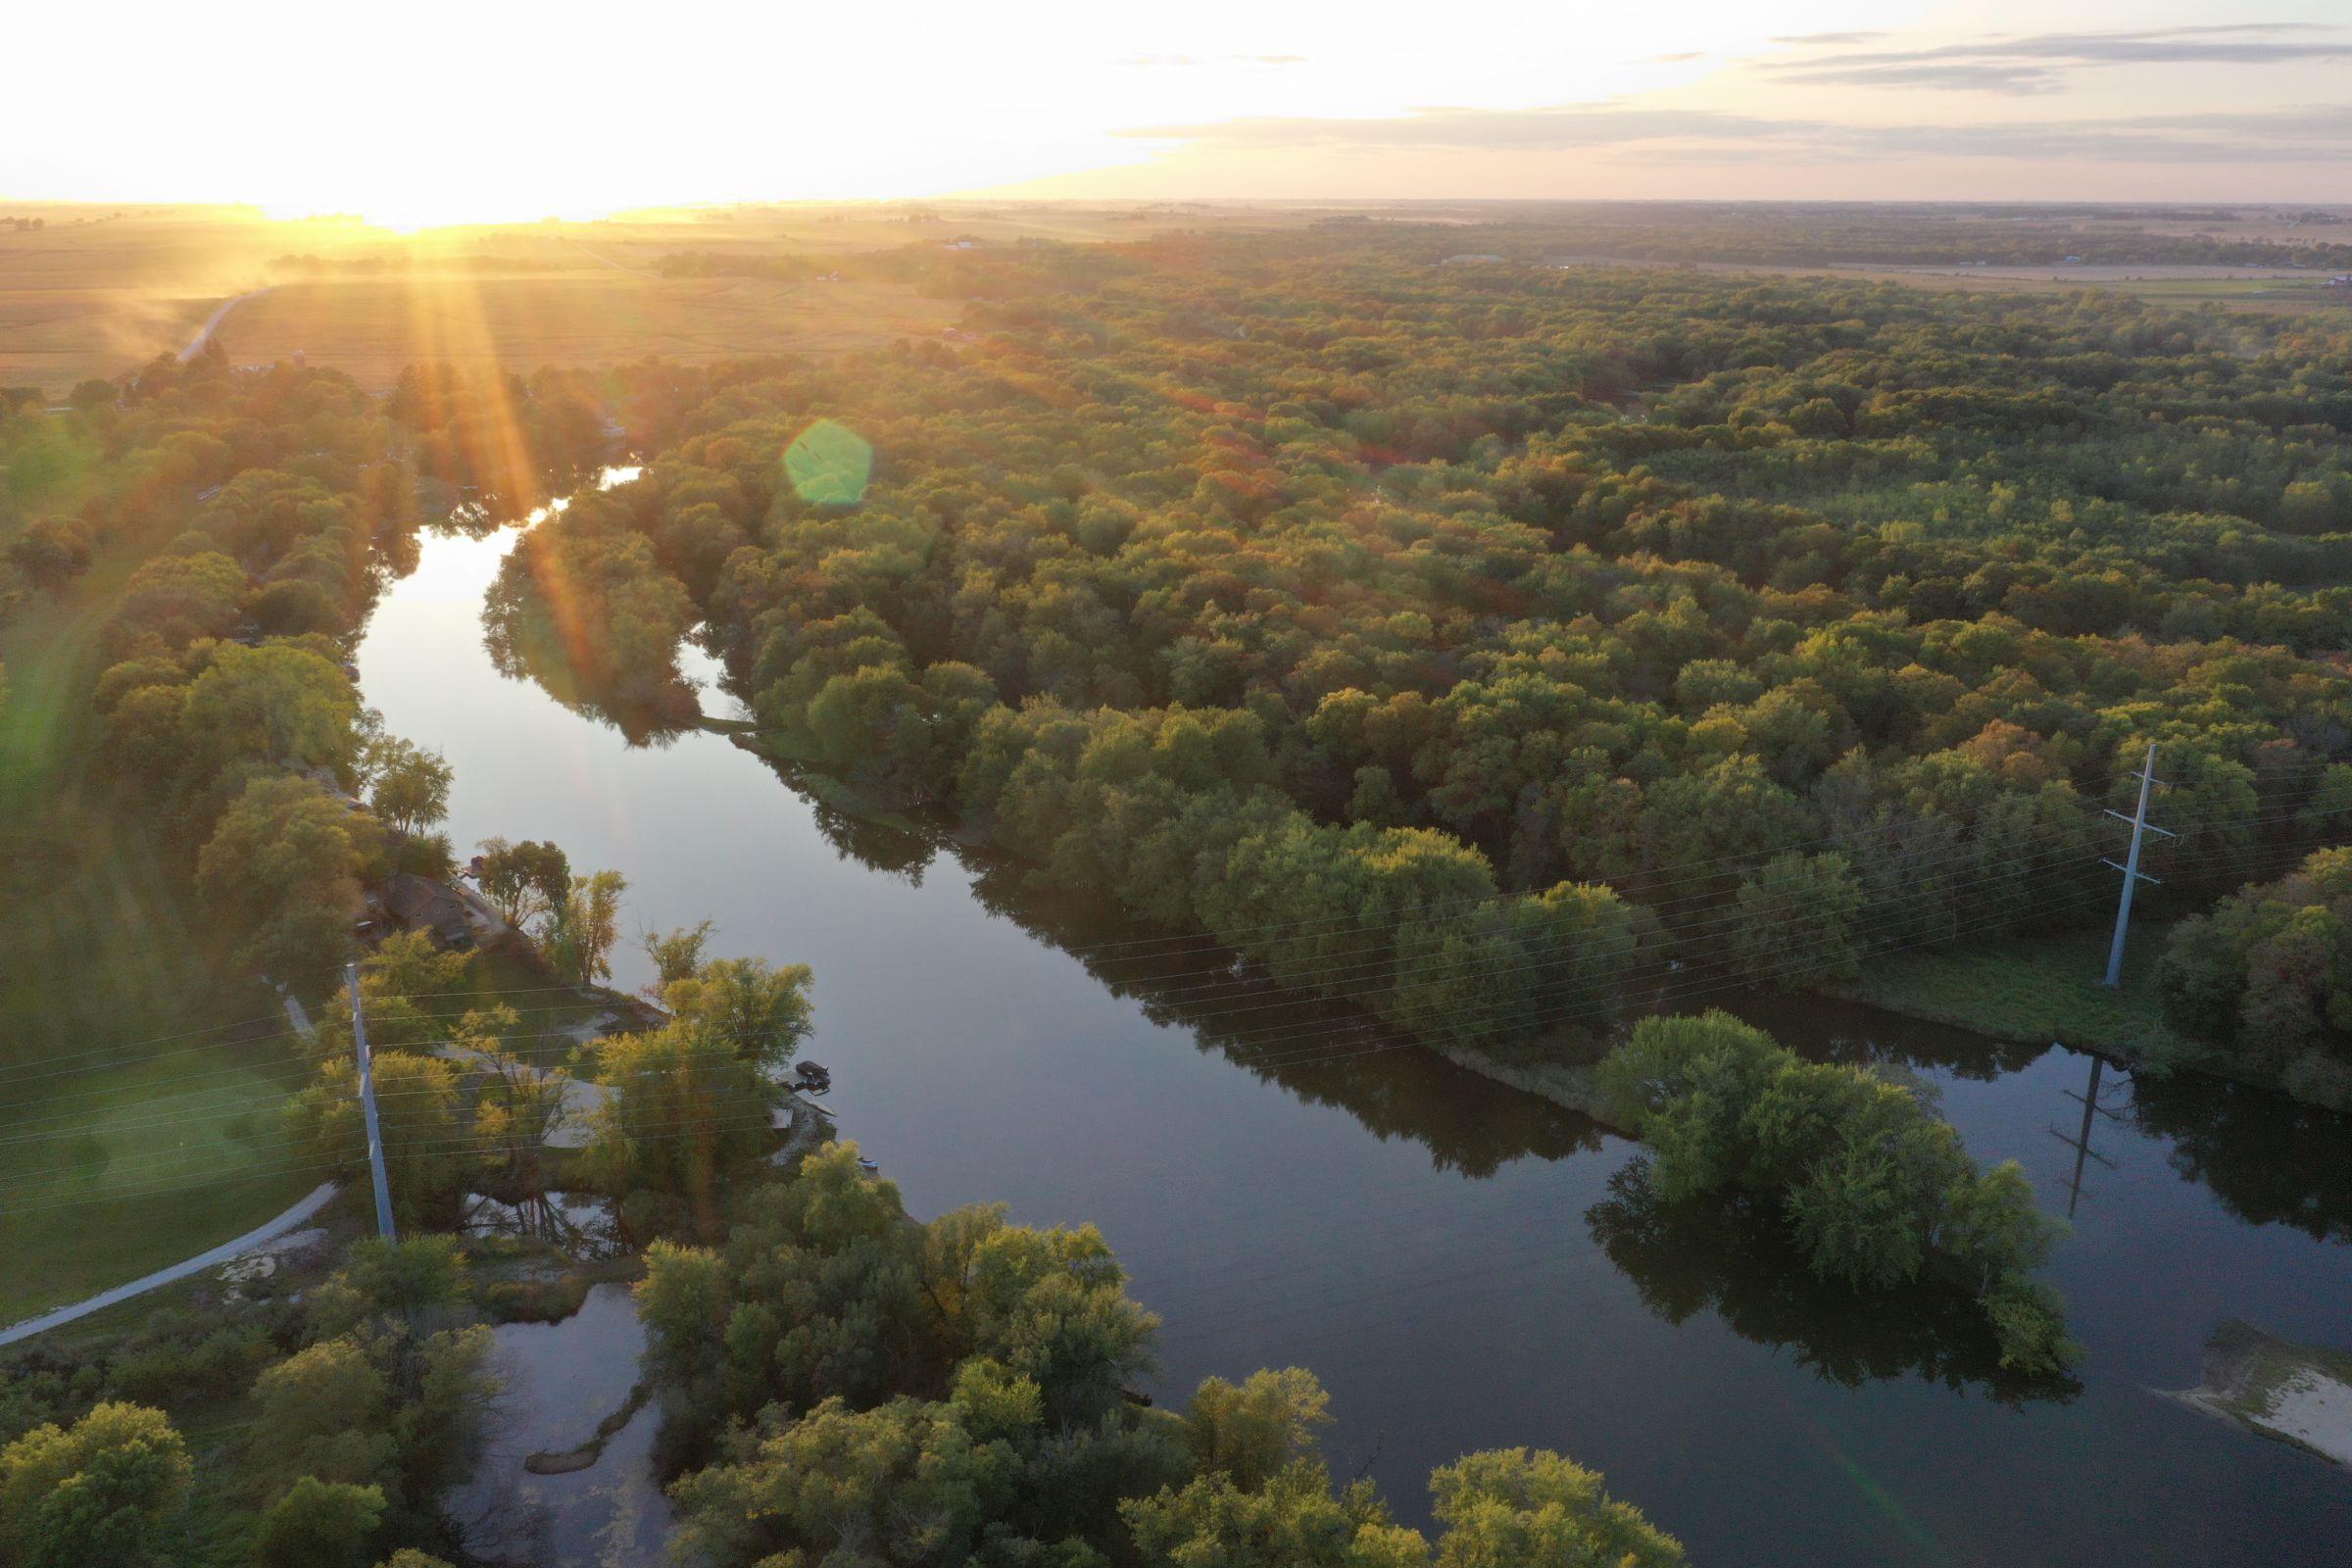 land-buchanan-county-iowa-33-acres-listing-number-14906-2-2020-10-28-160517.JPG